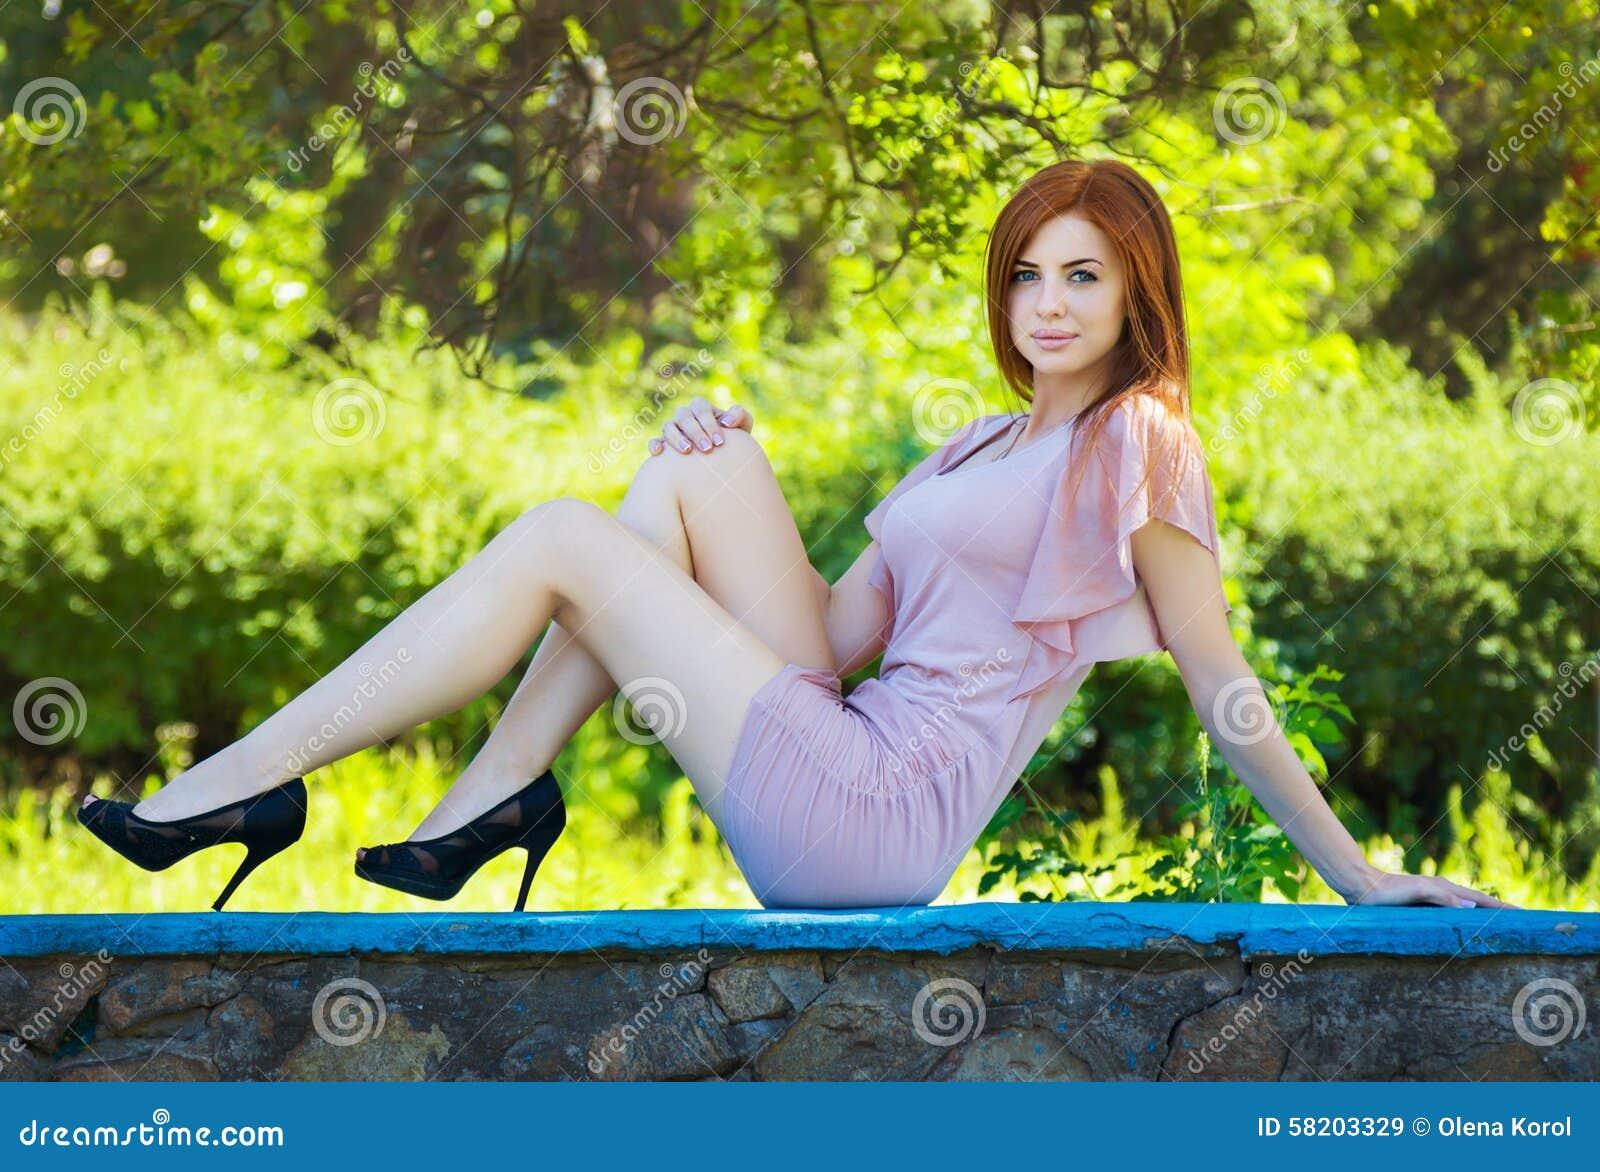 Woman in high heels